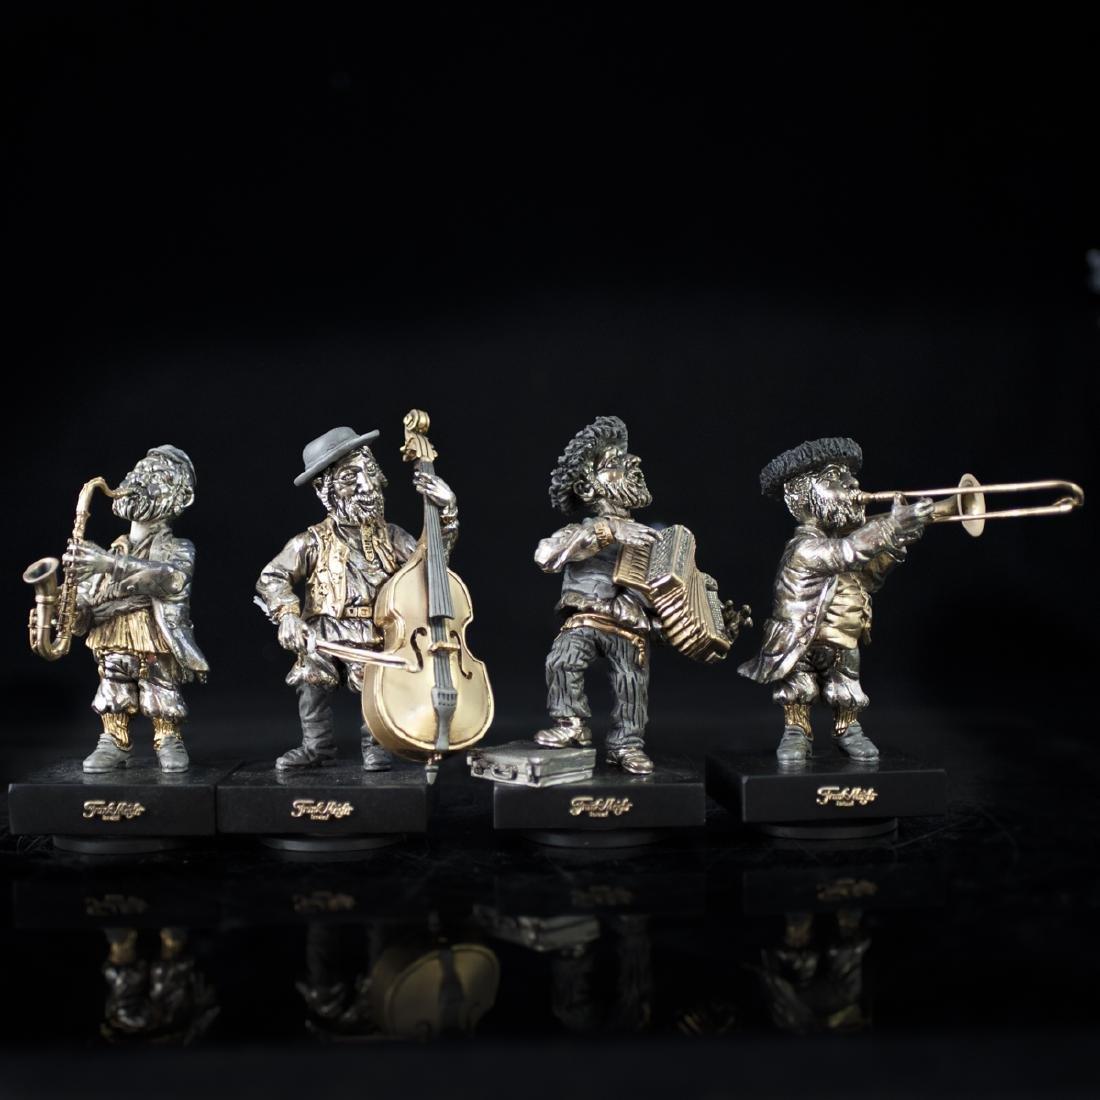 Limited Edition Frank Meisler Judaic Figurines